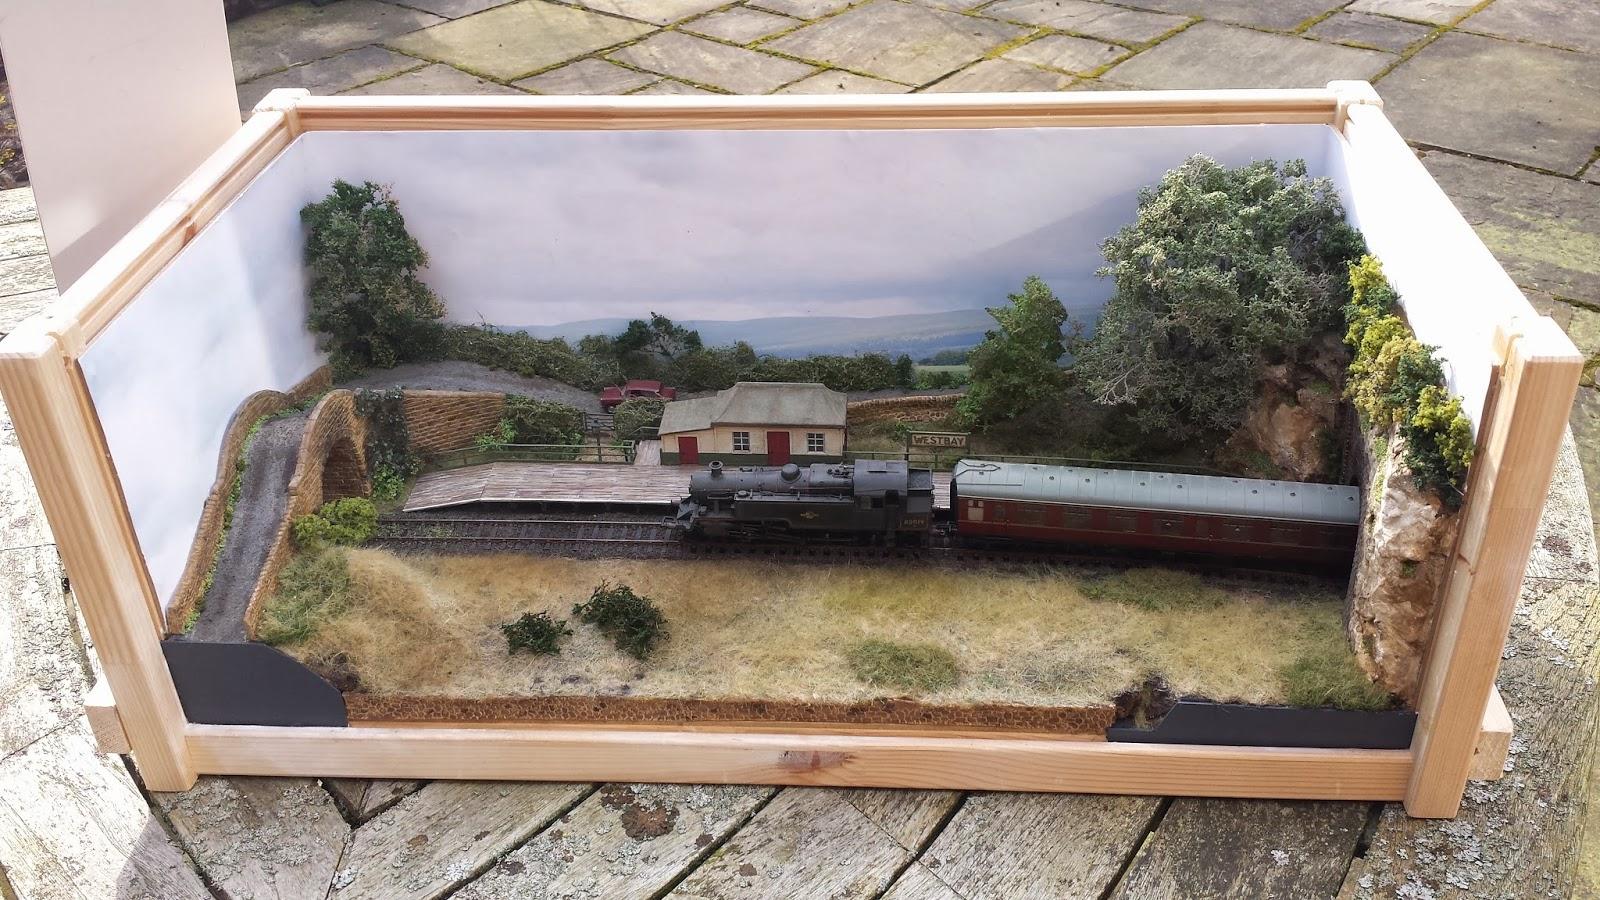 Chas S Model Railway